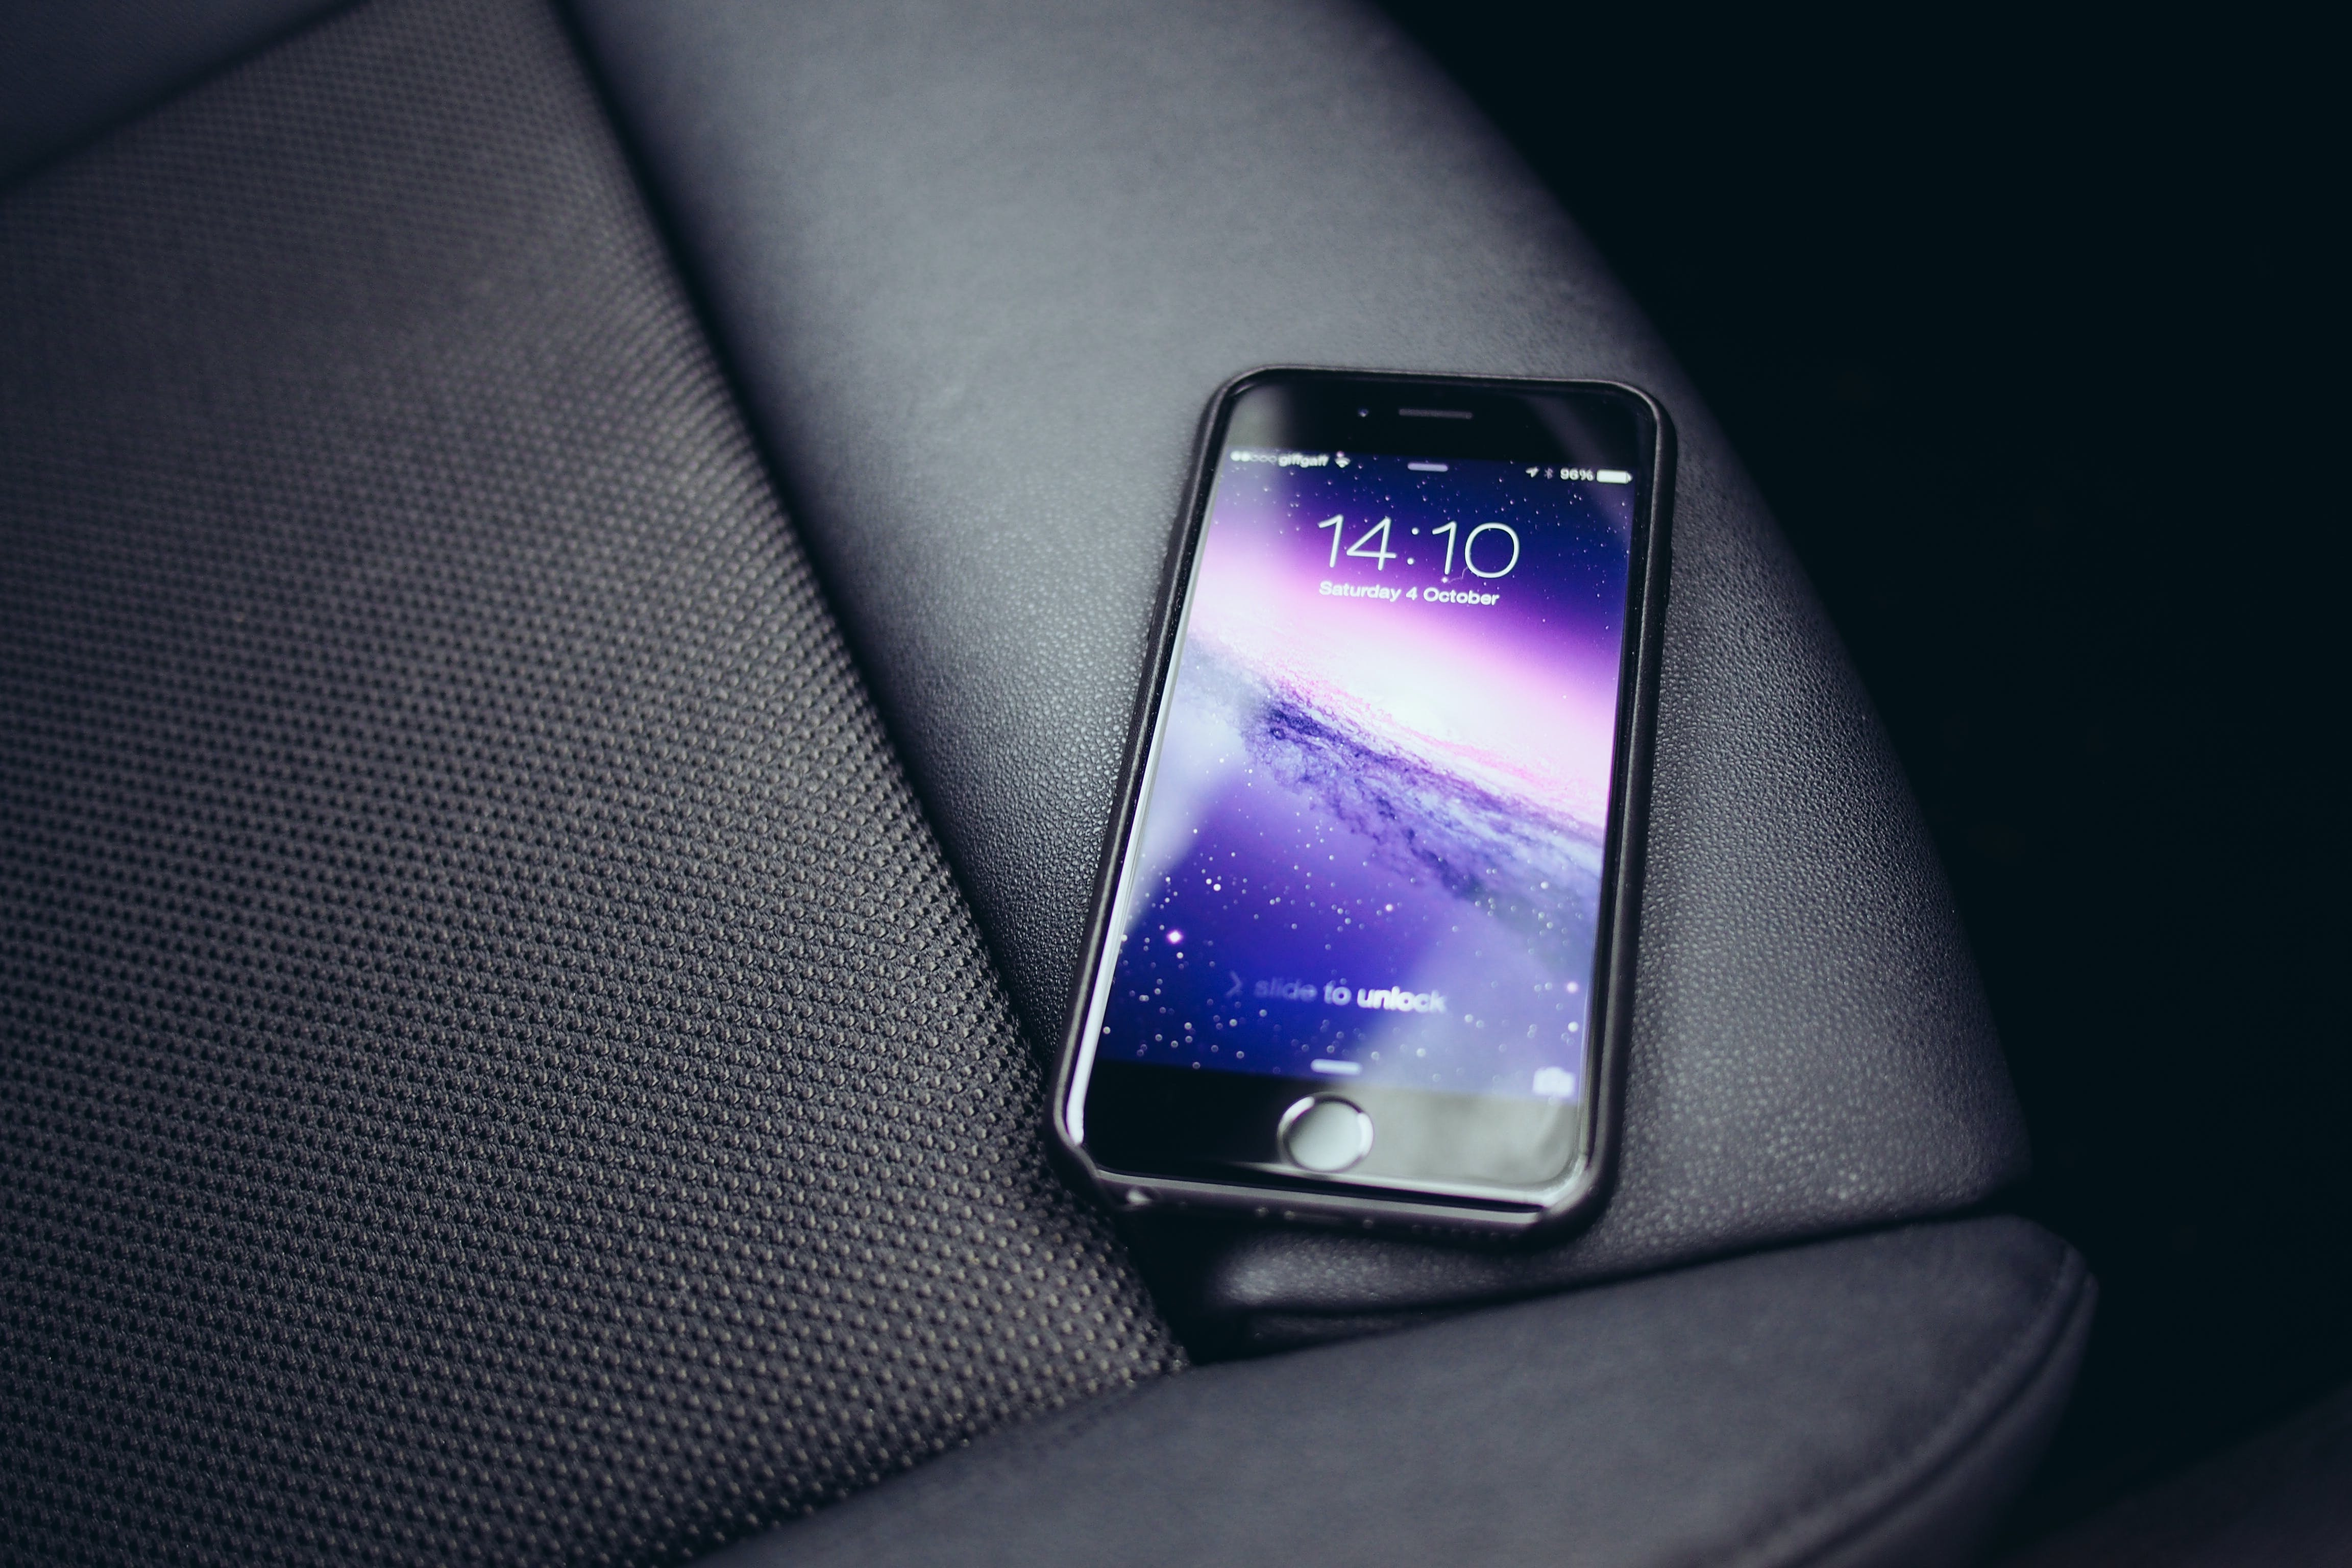 apple, digital, iphone 6